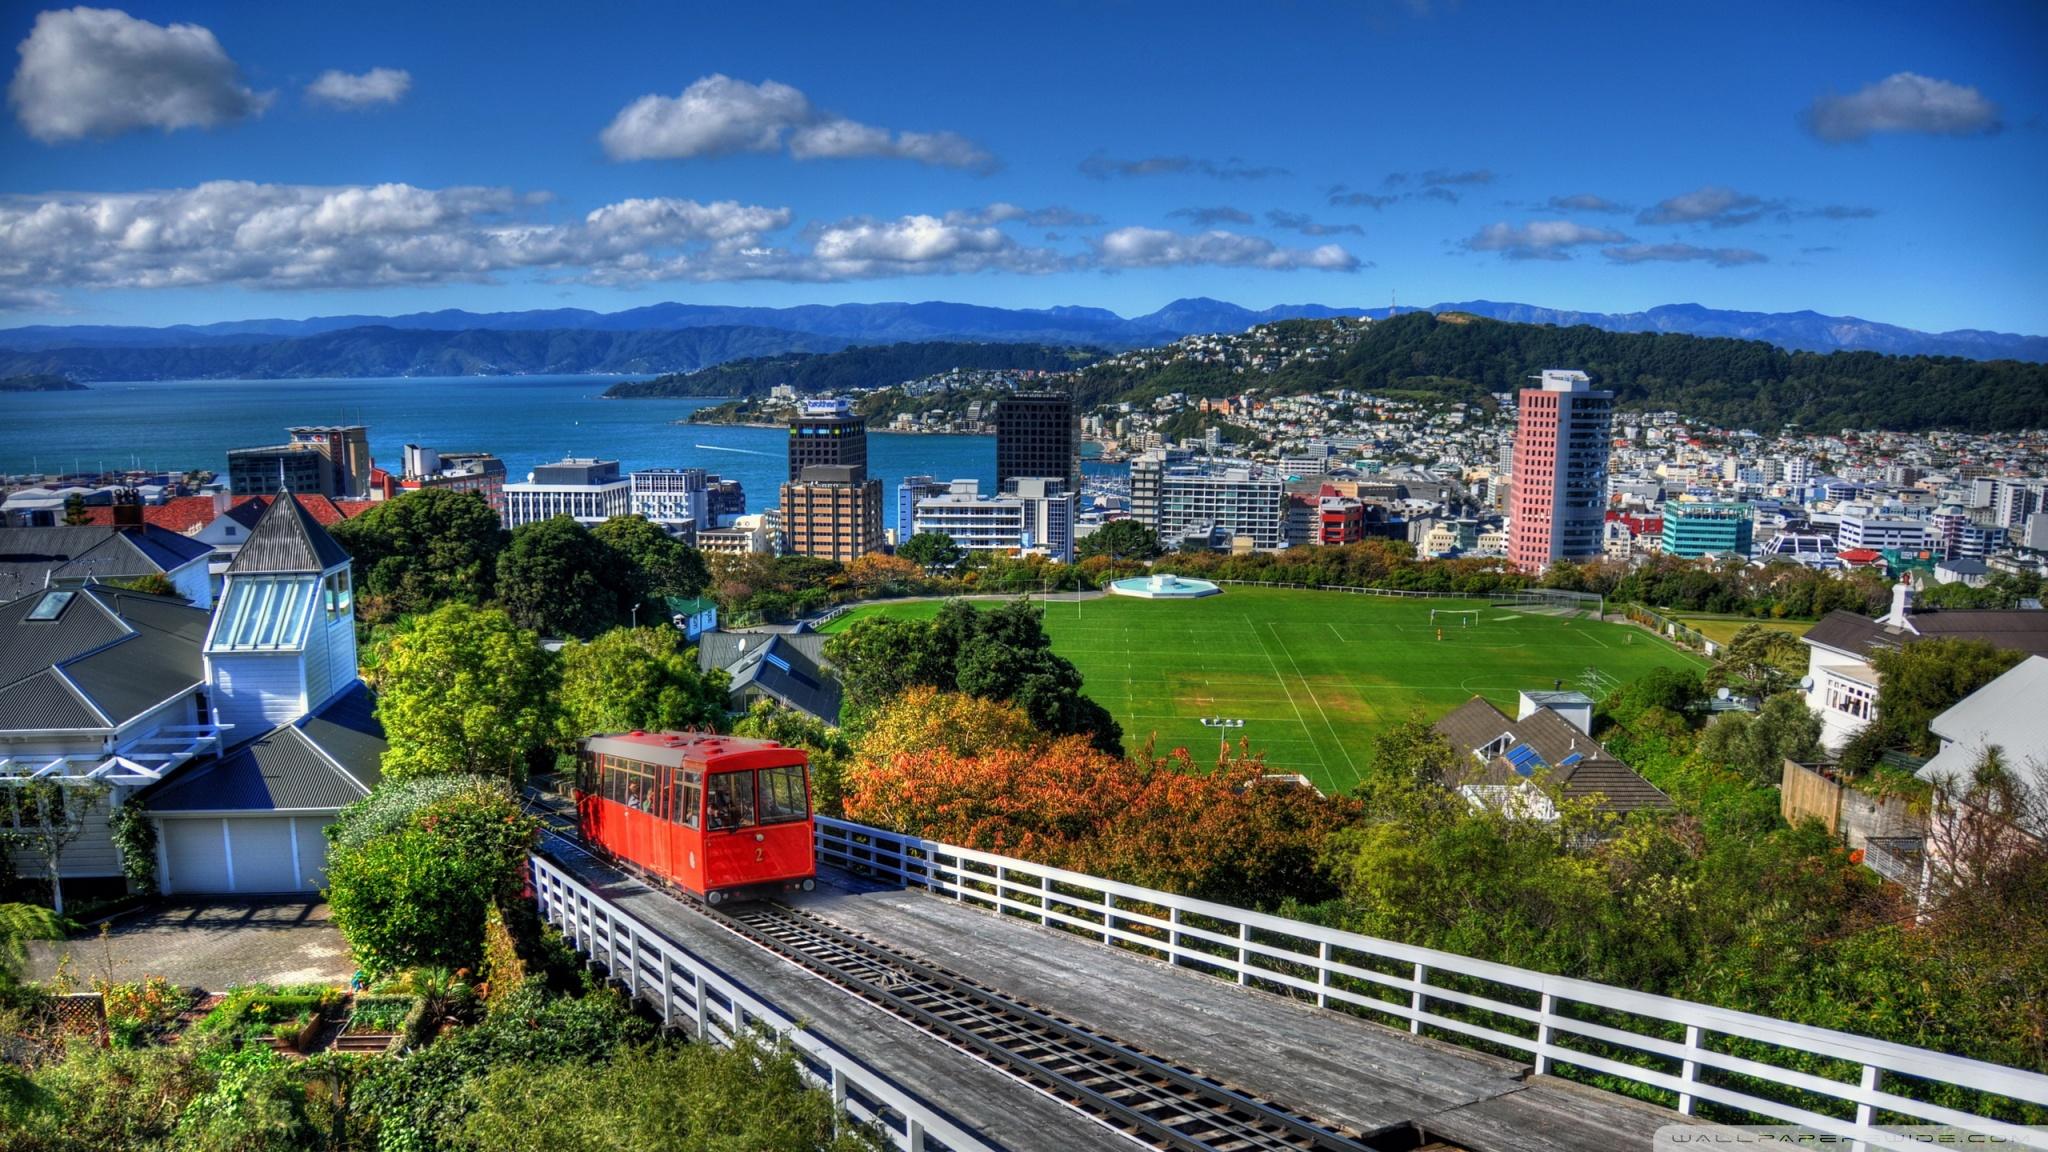 New Zealand Houses Wellington From Above 4K HD Desktop 2048x1152